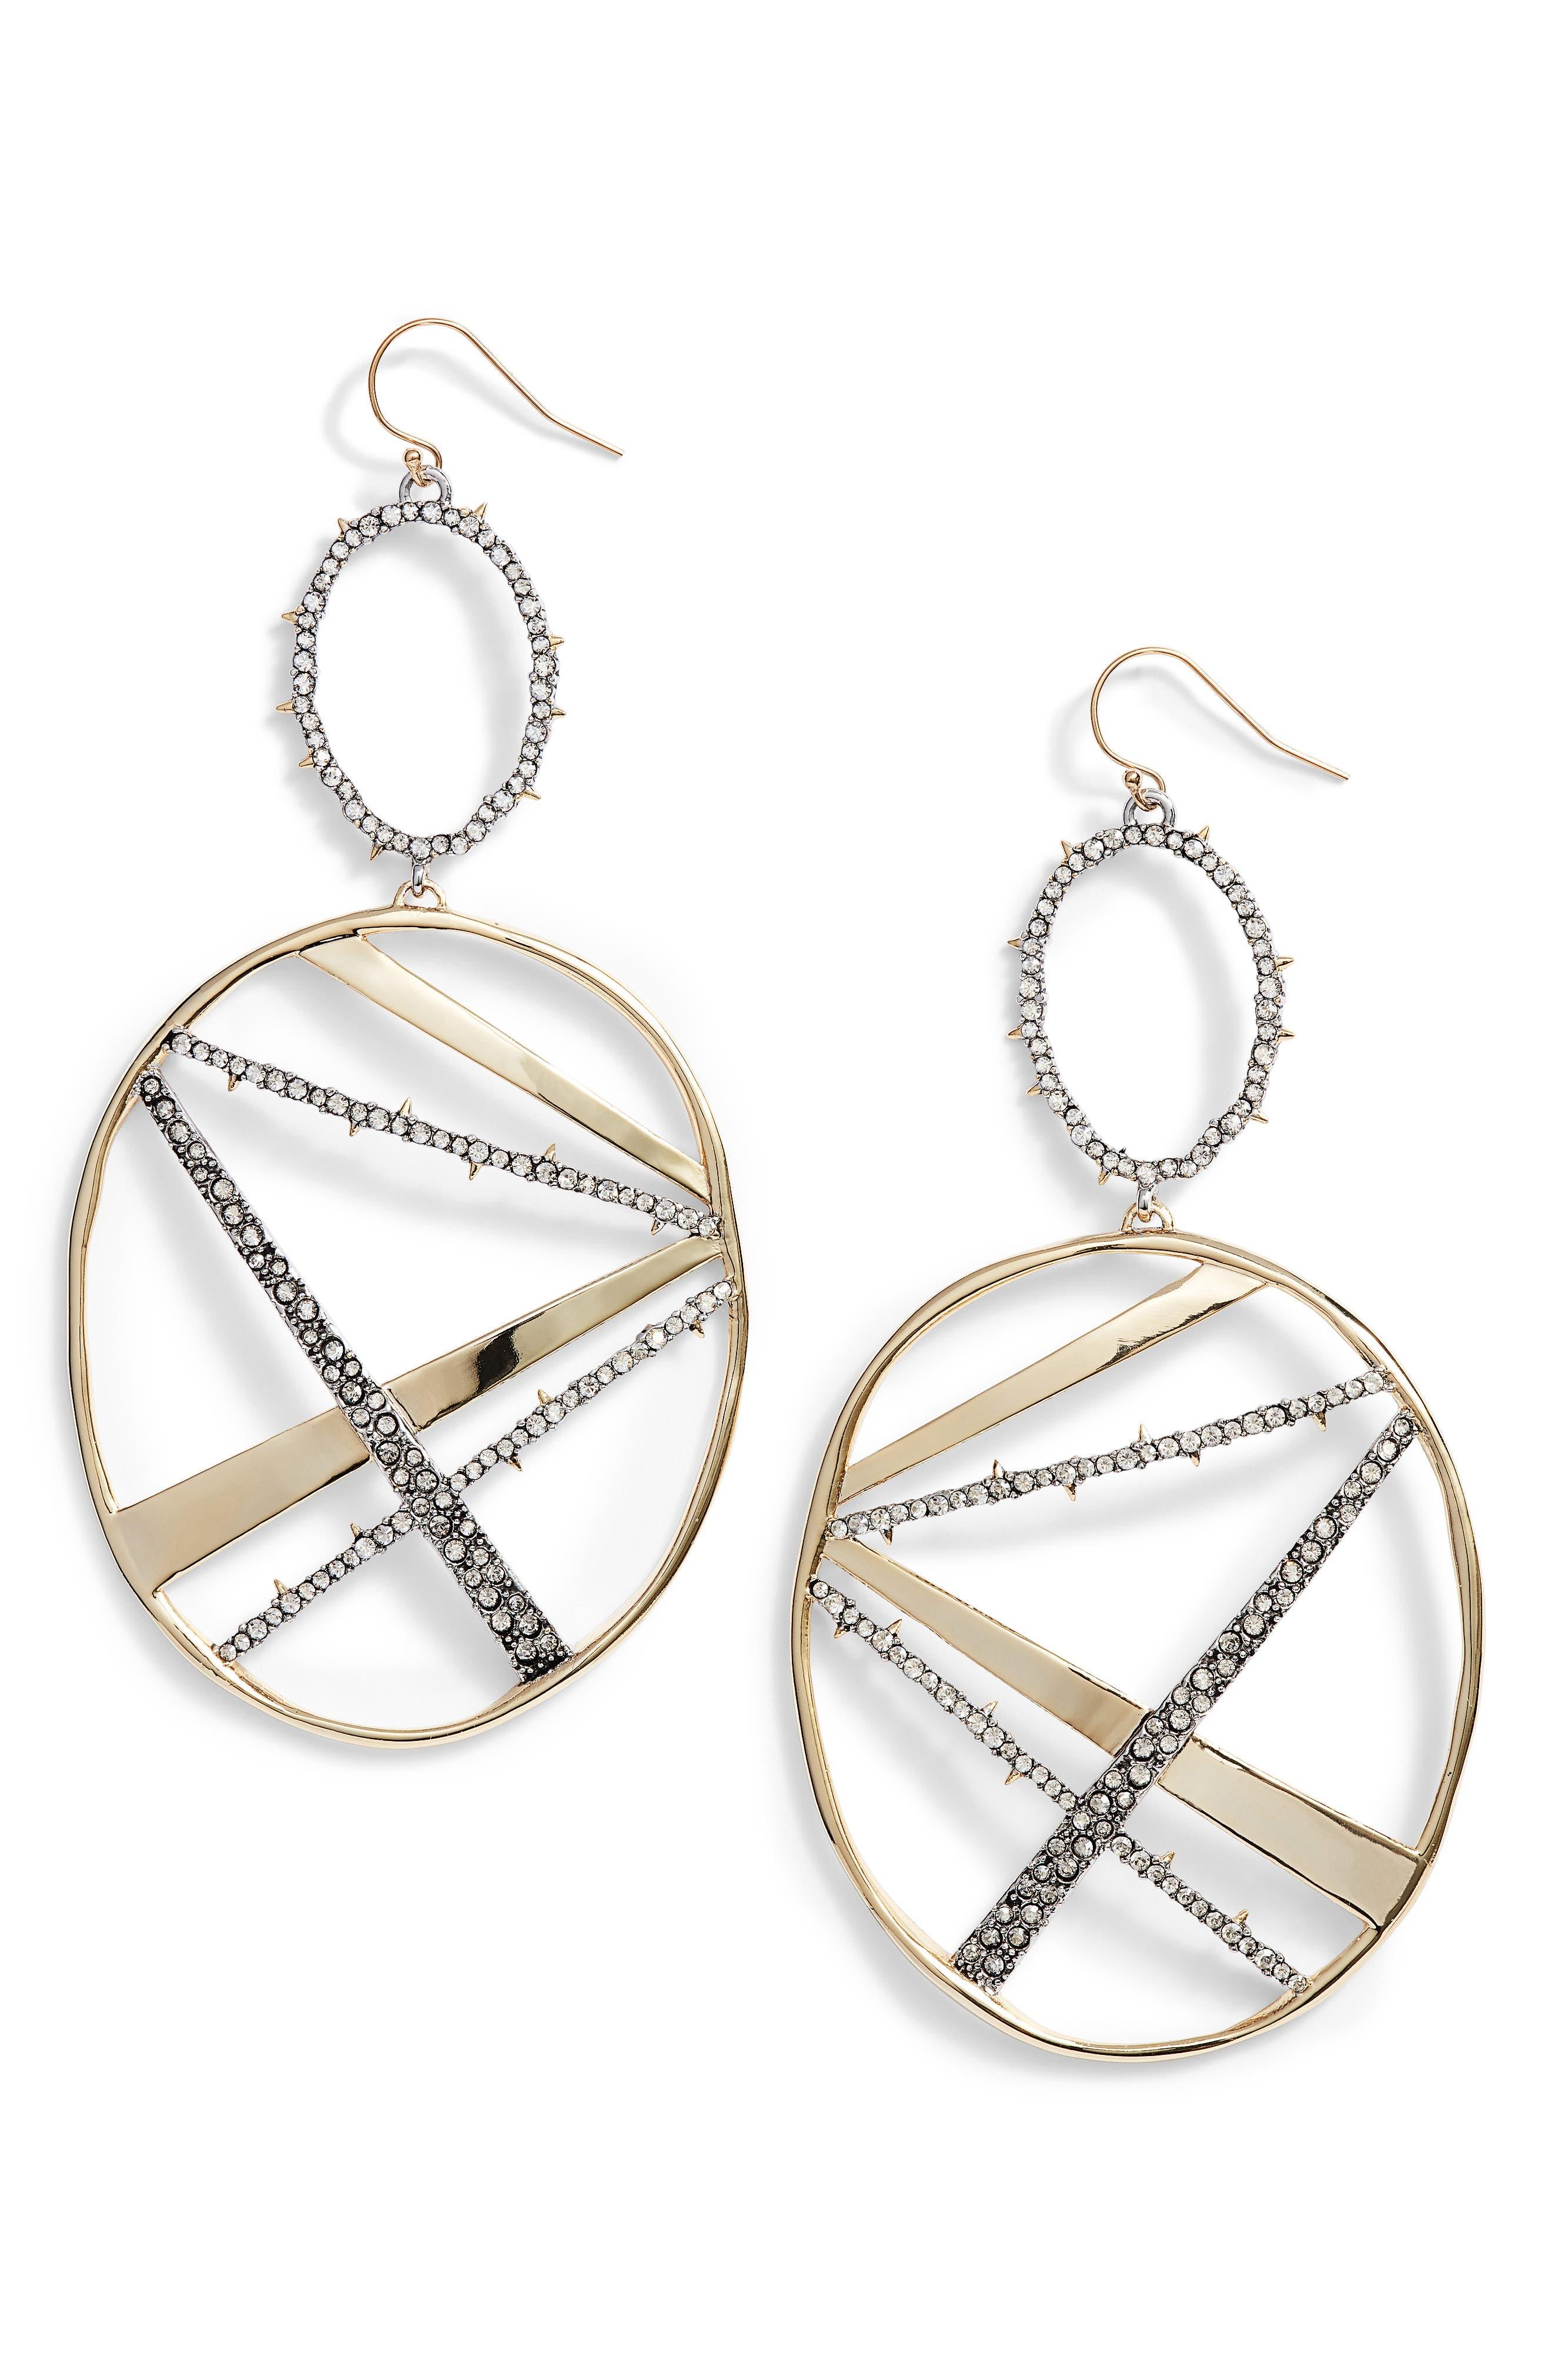 Oversize Dangling Hoop Earrings,                         Main,                         color, Gold/ Silver